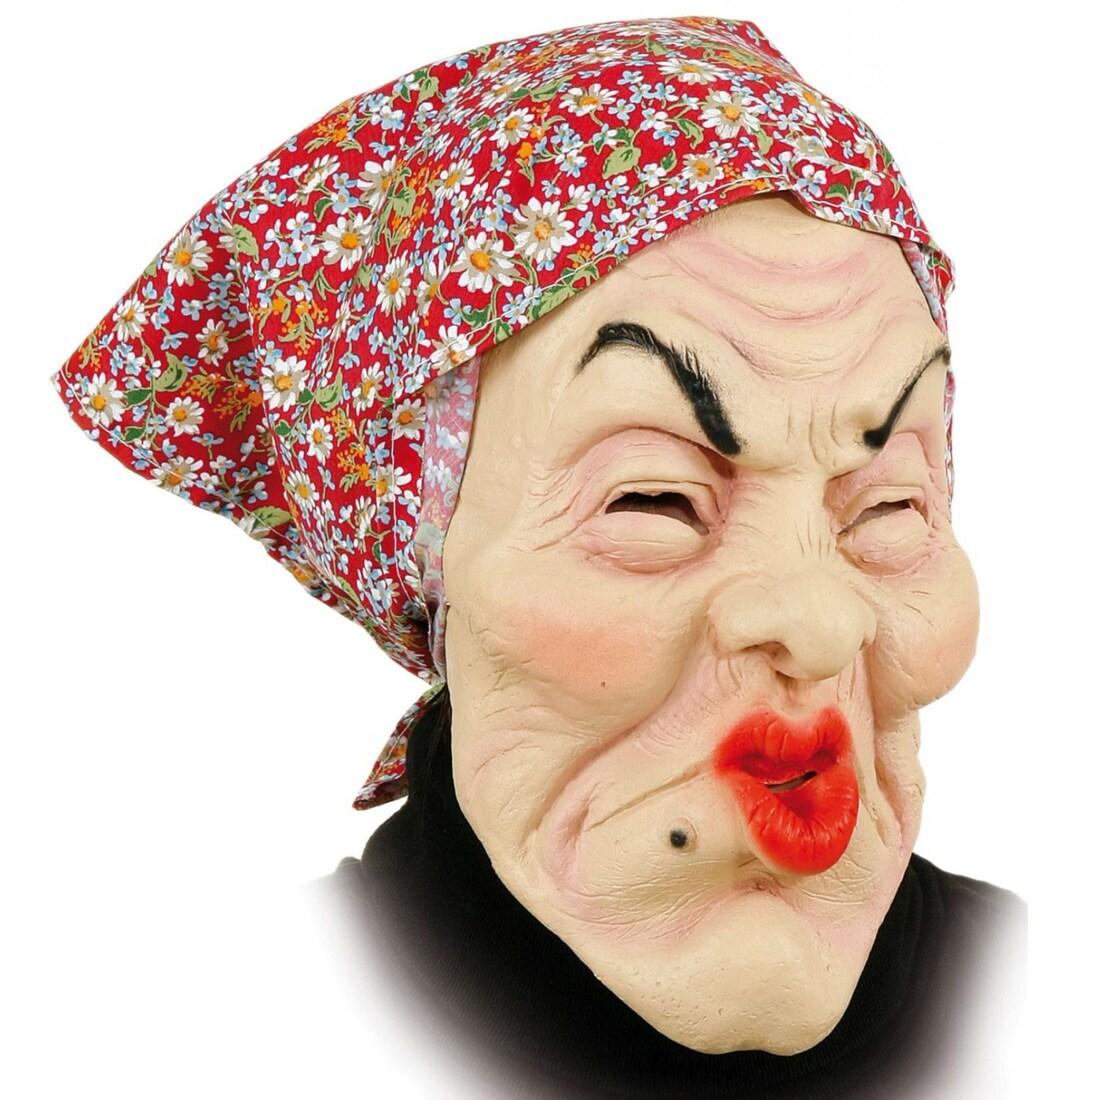 Gummi Maske Alte Frau Oma Masken Kostum Zubehor 9 99